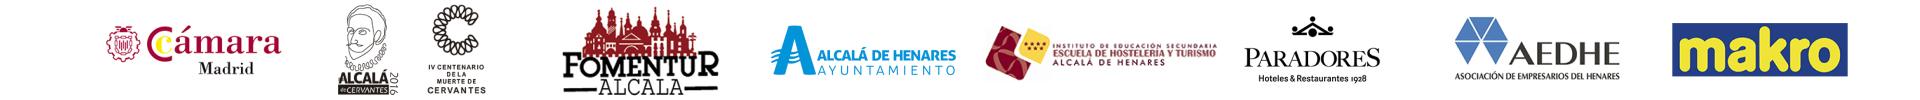 http://saboresmasquegolf.com/wp-content/uploads/2016/03/Tercer-certamen-Alcala-Gastronomica-Auntamiento-camara-de-comercio-Encin-Golf-Sabores-Mas-que-Golf-Sponsors.jpg